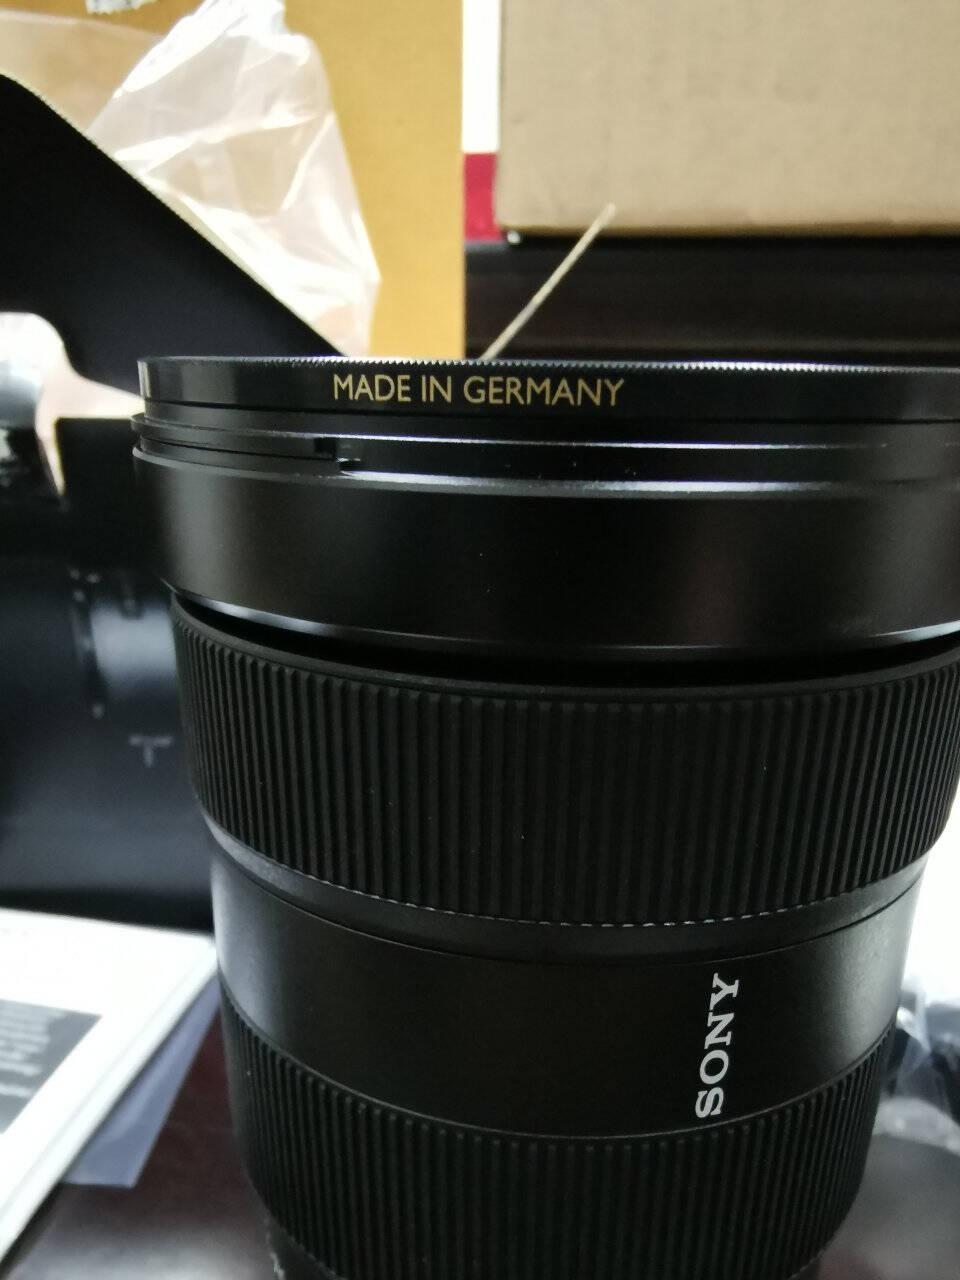 B+Wuv镜滤镜62mmUV镜MRCNANOXS-PRO超薄多层纳米镀膜UV镜保护镜